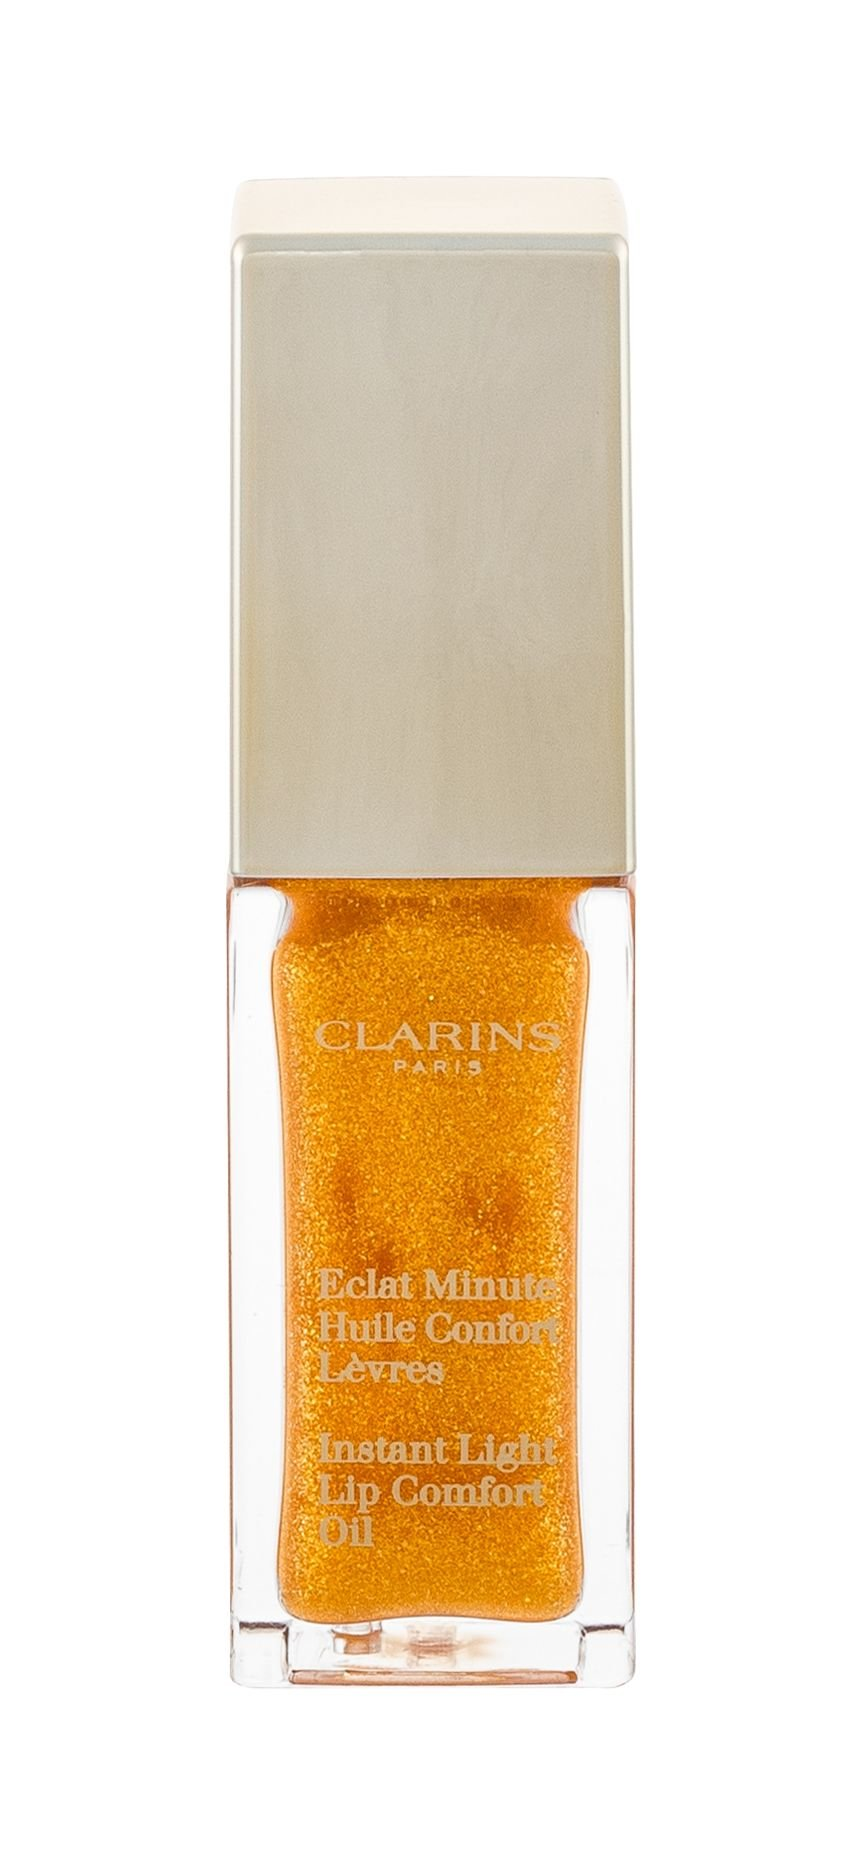 Clarins Instant Light Lip Gloss 7ml 07 Honey Glam